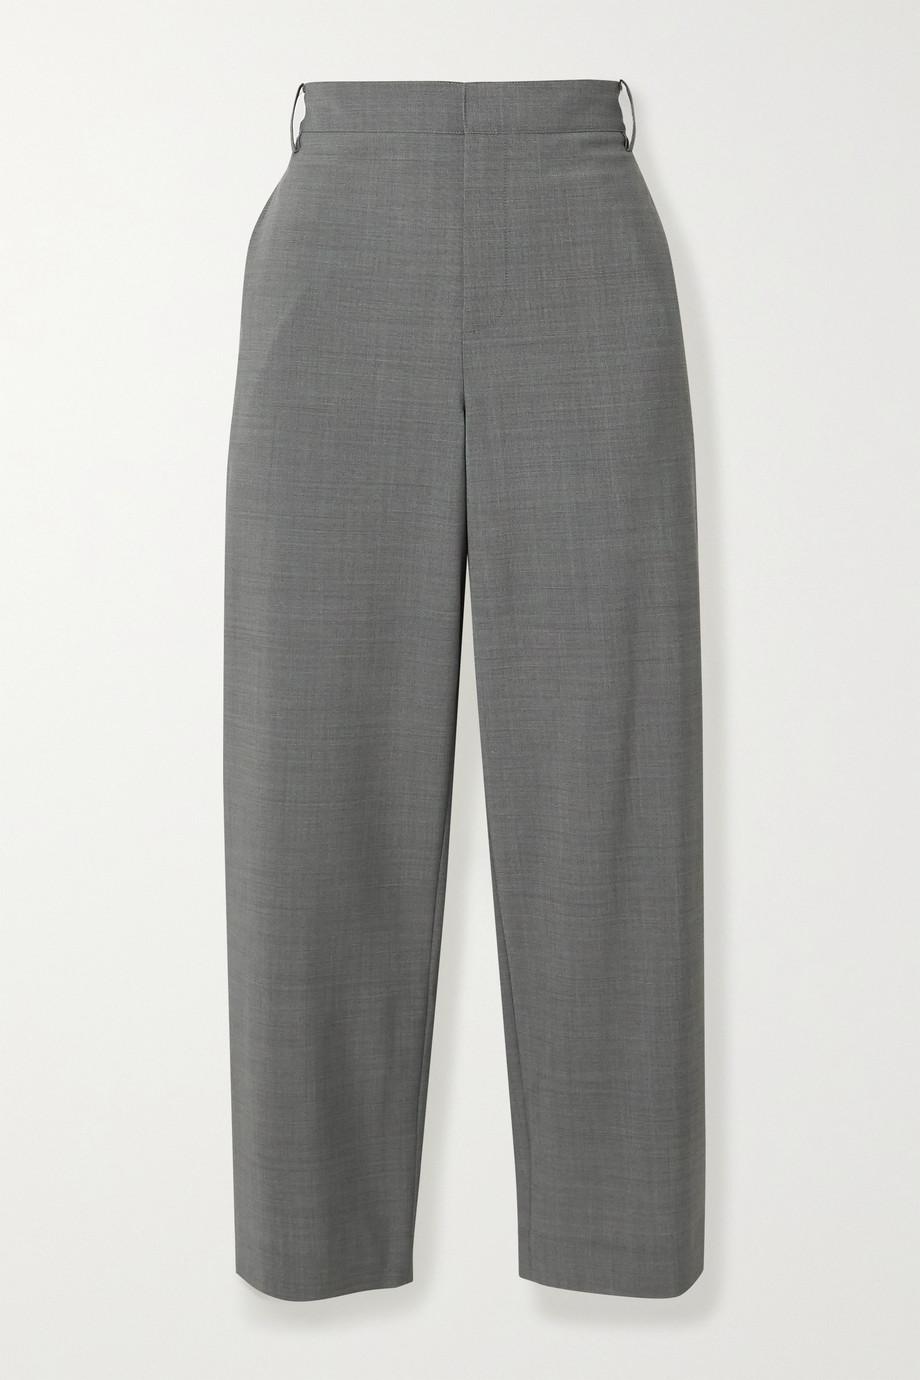 Tibi Cropped woven straight-leg pants